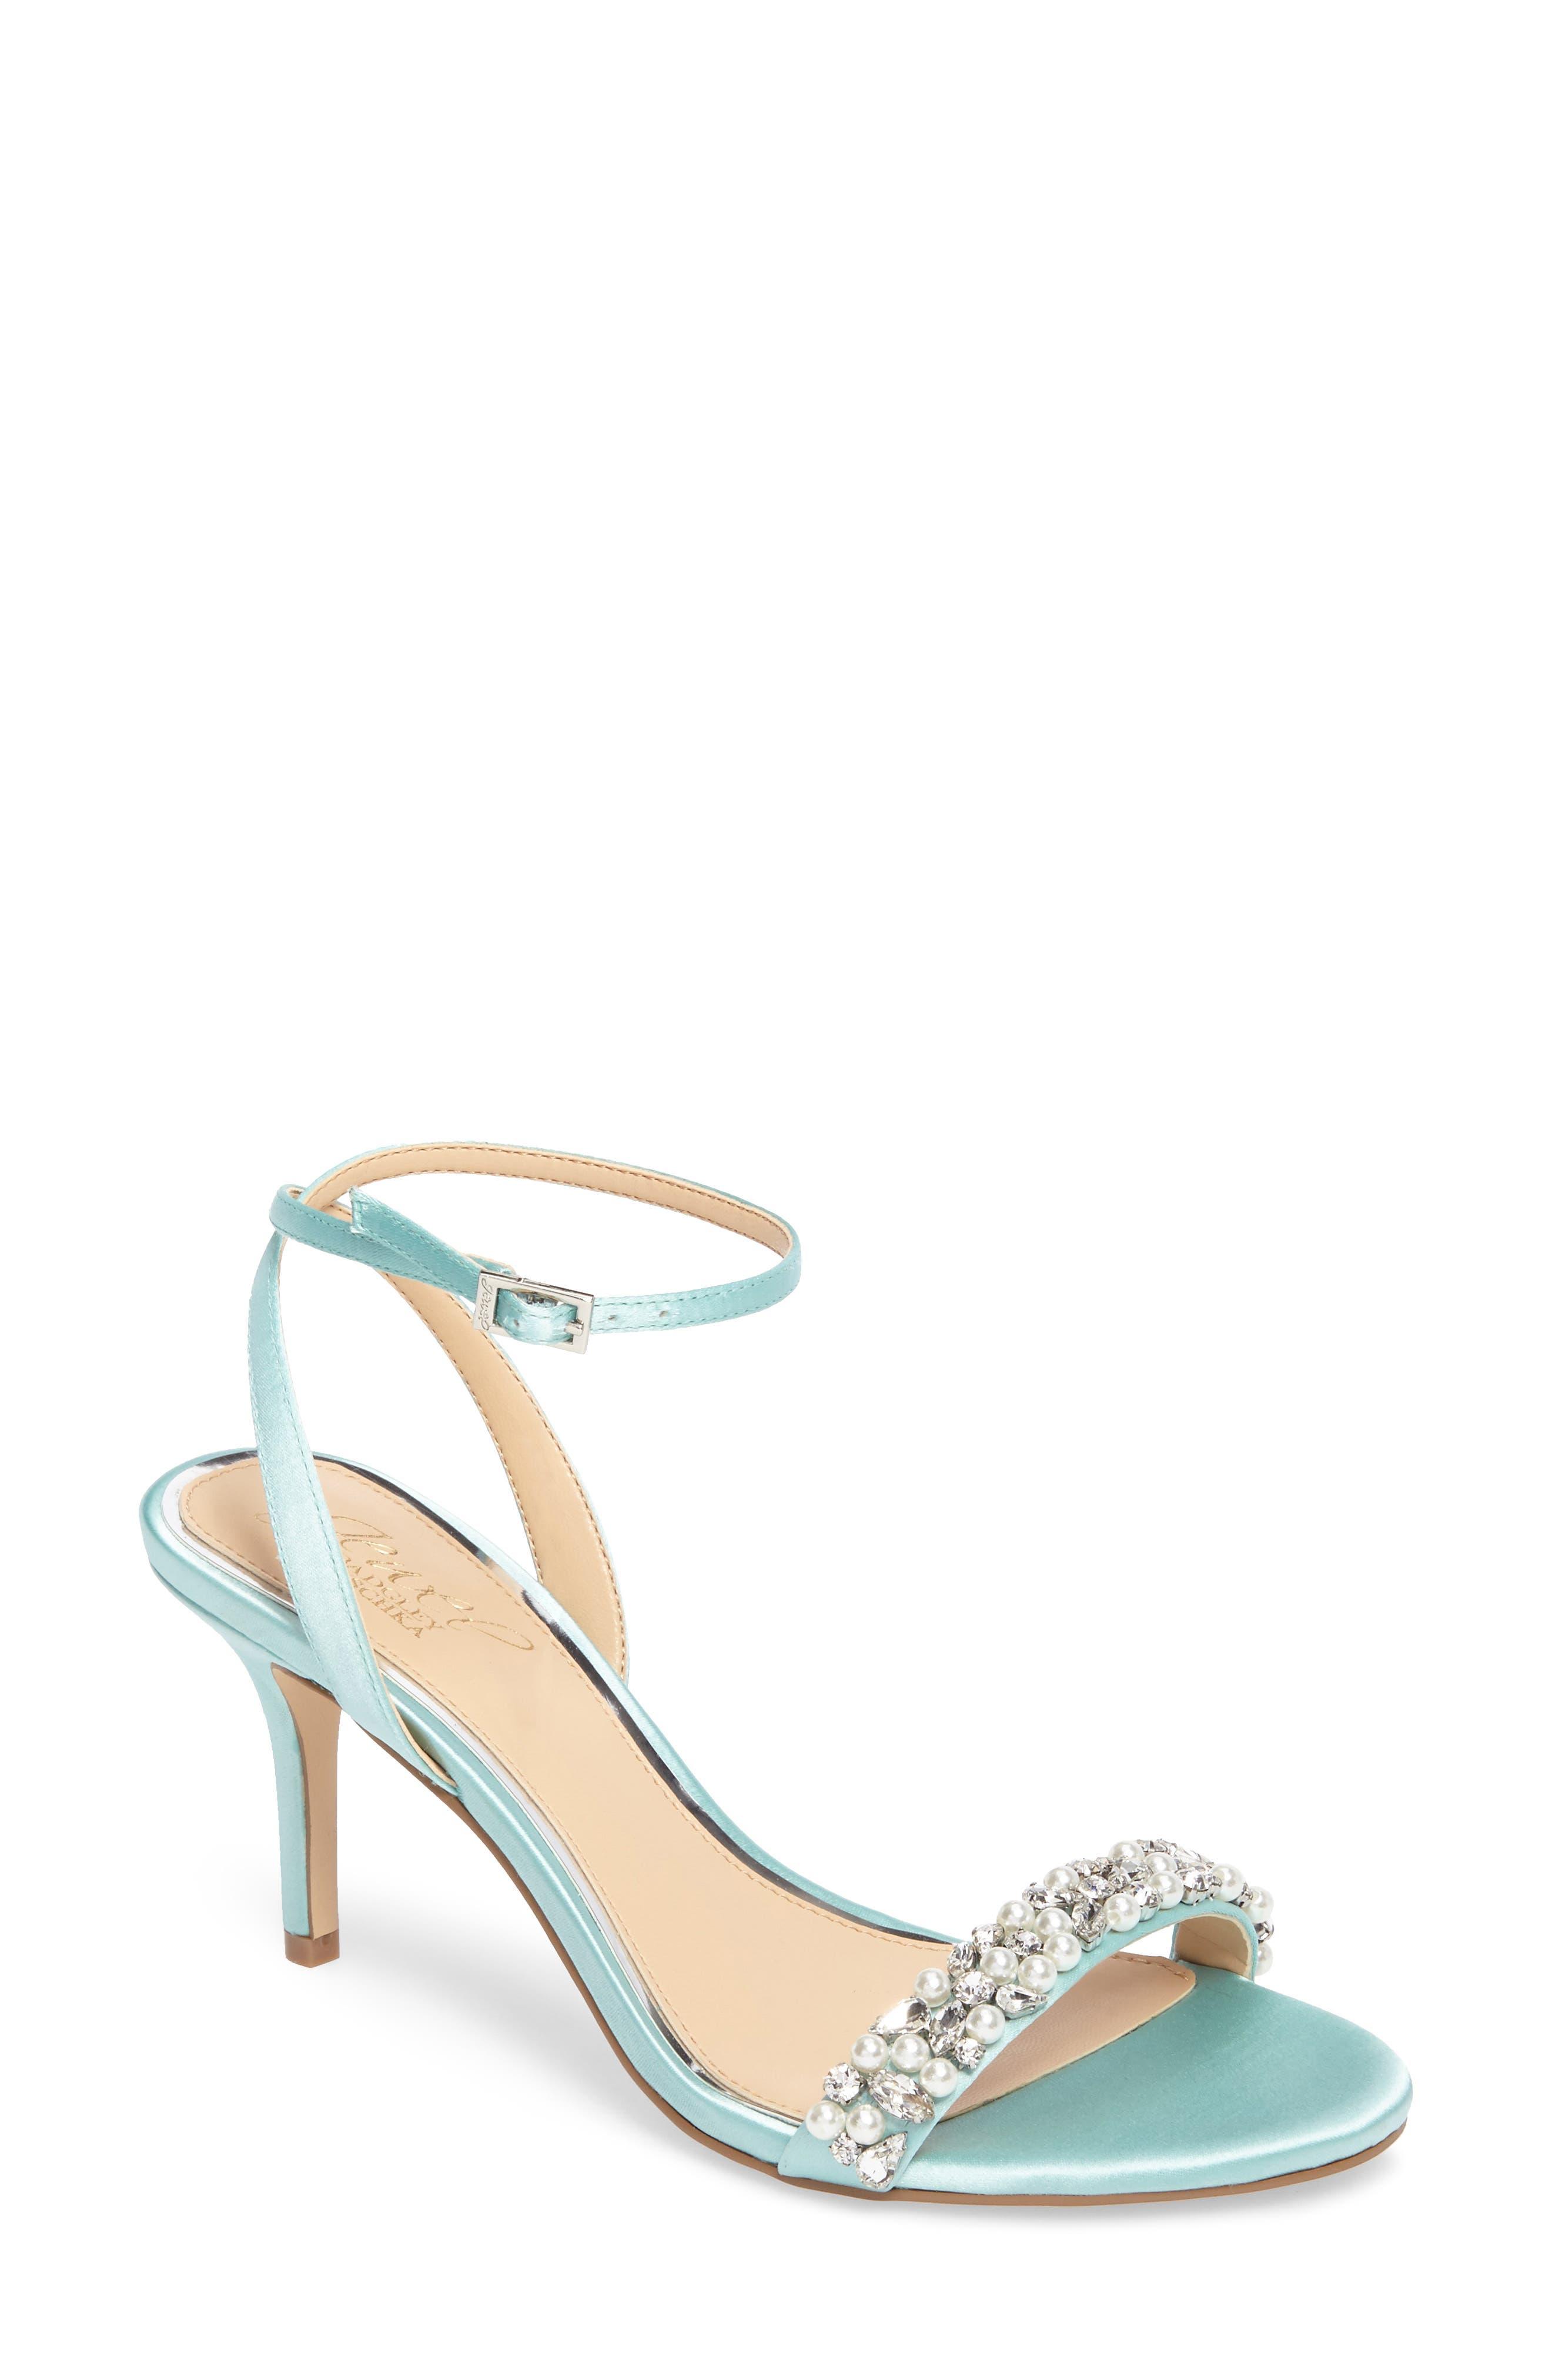 Jewel by Badgley Mischka Theodora Ankle Strap Sandal (Women)